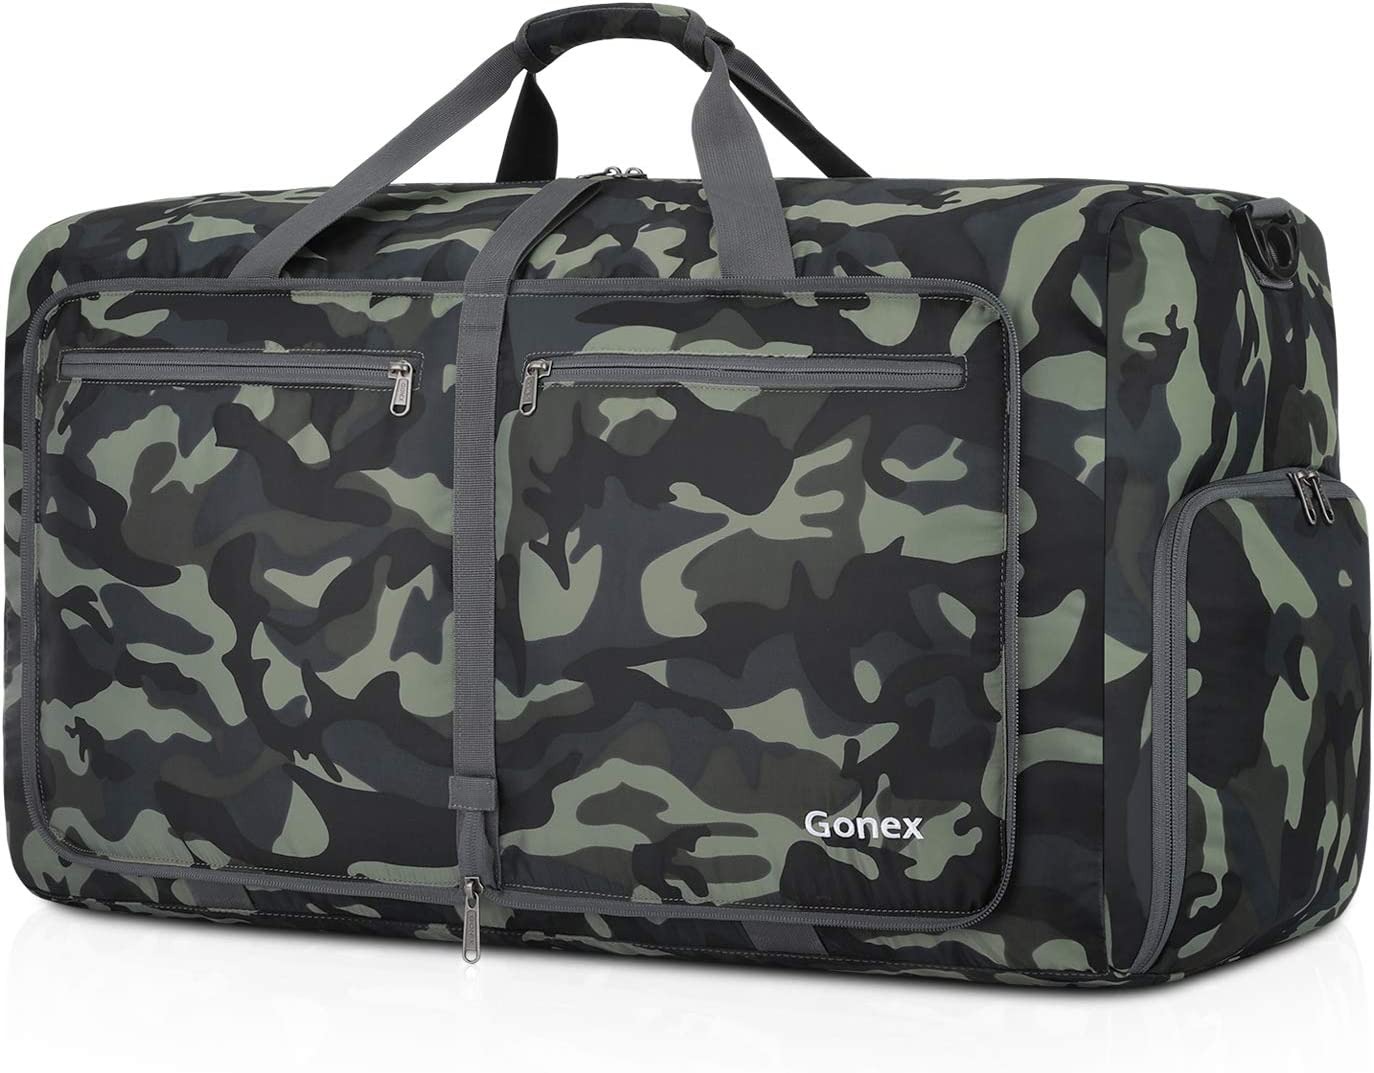 Gonex Bolsa de Viaje 80L, Plegable Ligero Bolso Equipaje Maleta Grande Bolsas Deportes Gimnasio Maletas de Mano Impermeable Duffel Travel Bag para Hombres y Mujeres Fin de Semana (Verde Camuflaje)